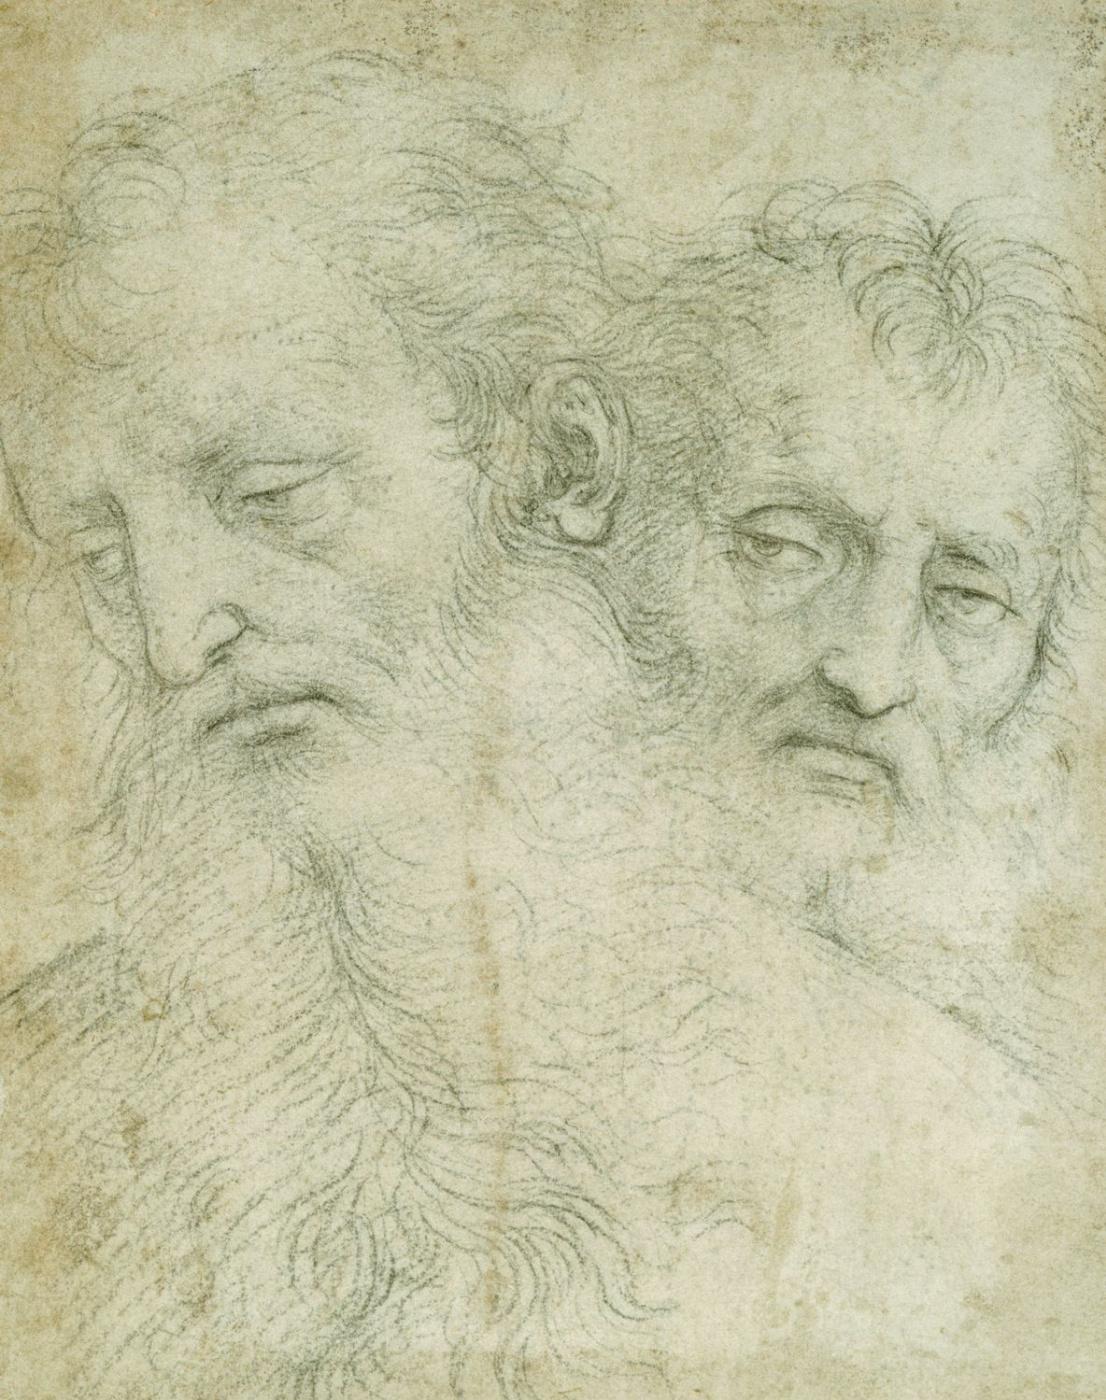 Raphael Sanzio. Sketch portraits of the two apostles